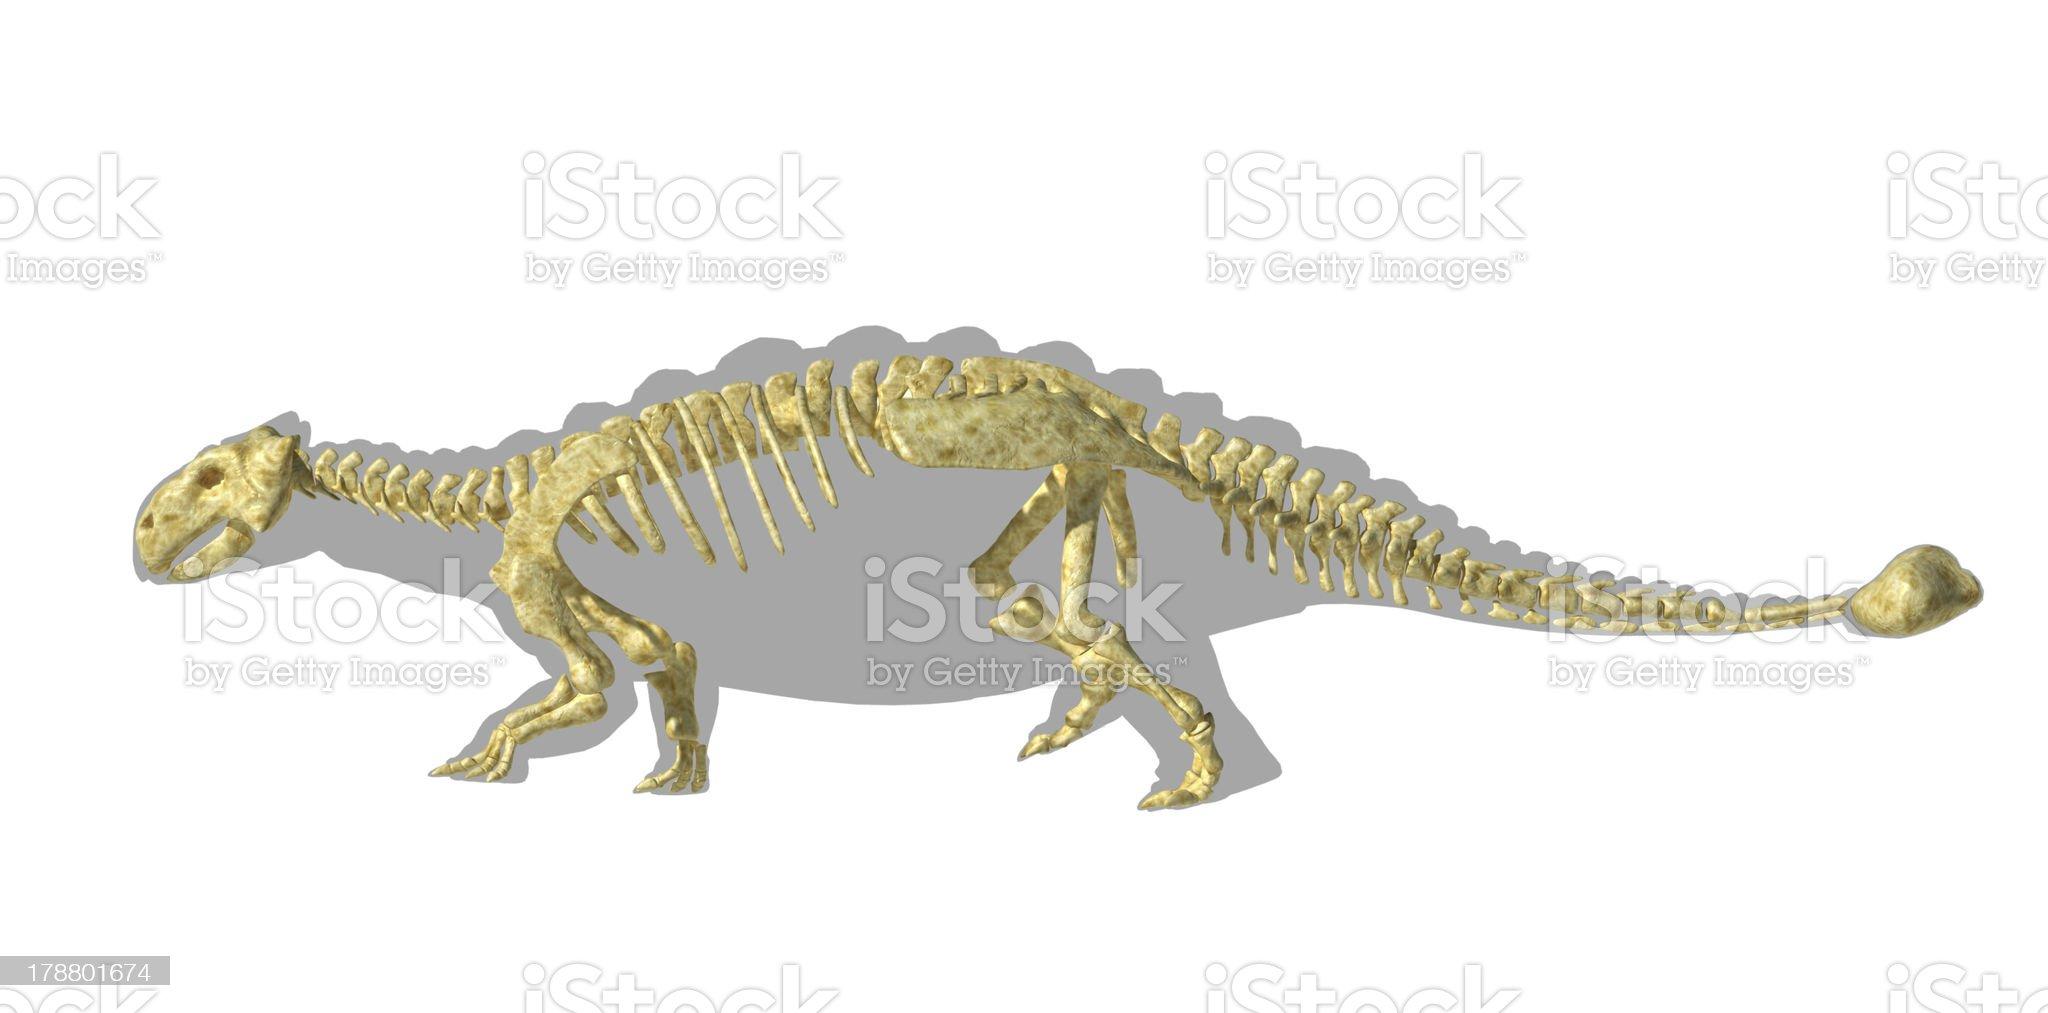 Ankylosaurus dinosaurus silhouette, with full skeleton superimposed. Side view. royalty-free stock photo